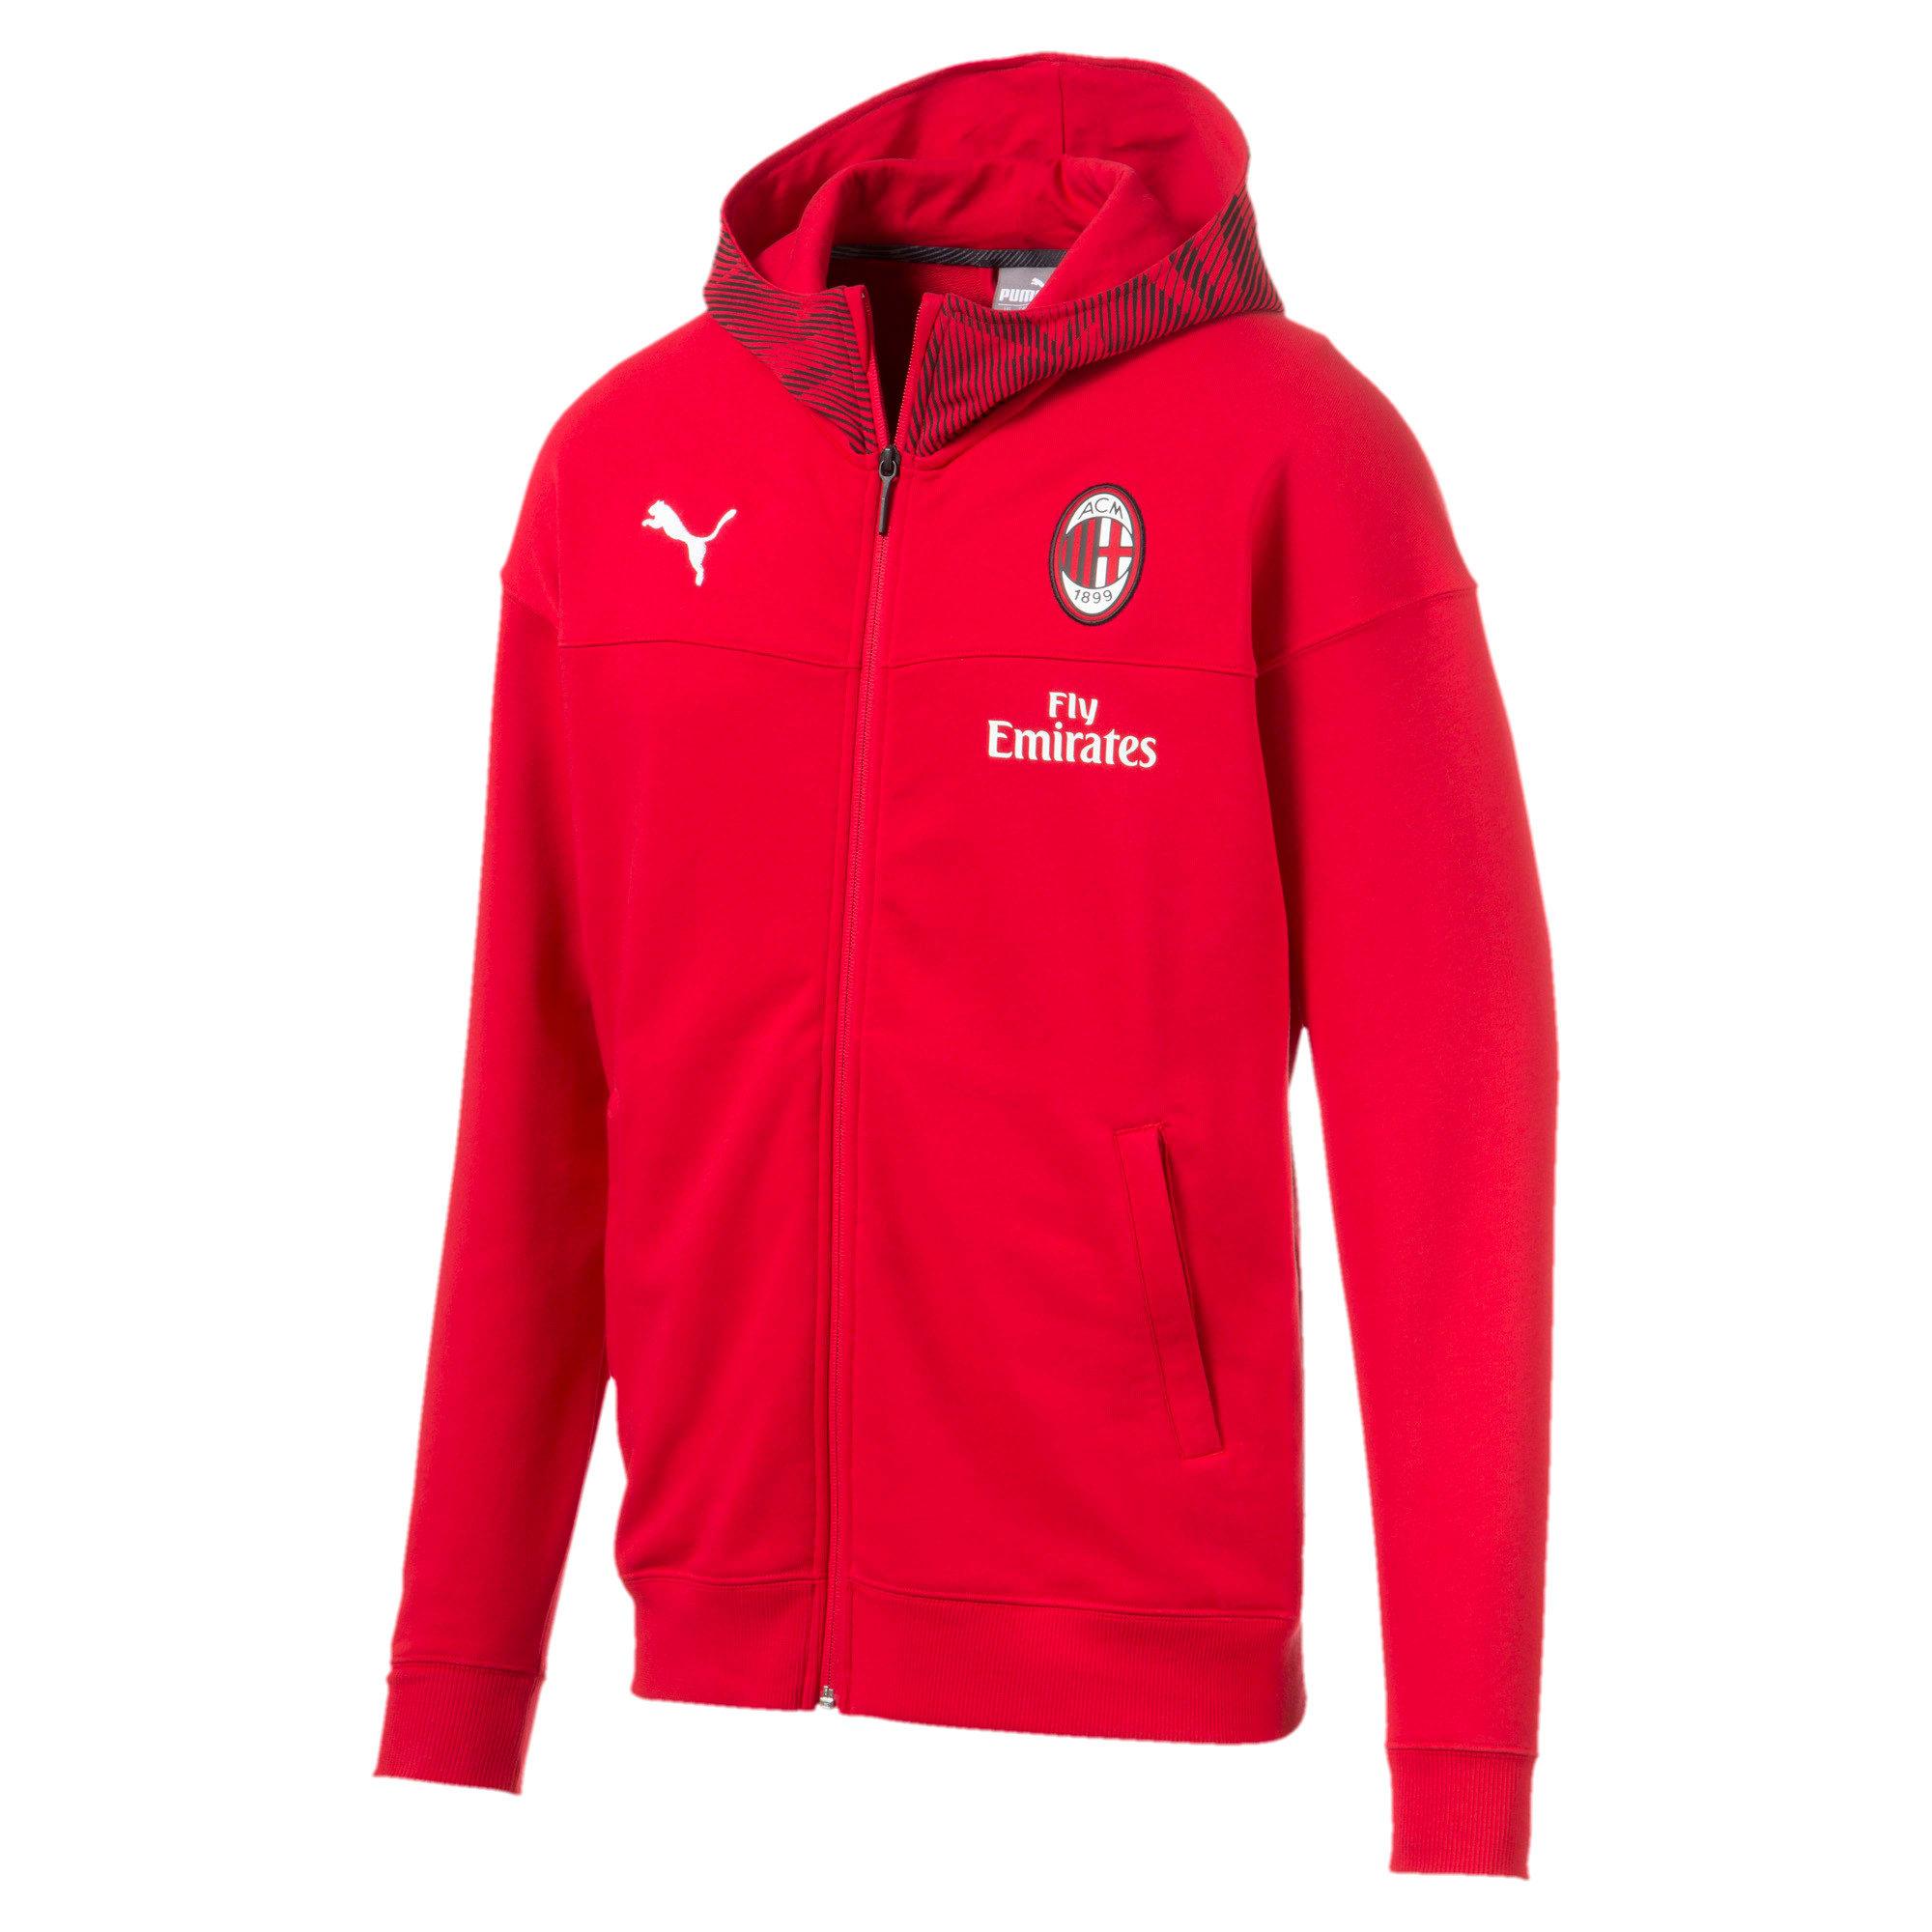 Thumbnail 4 of AC Milan Casuals Men's Hoodie, Tango Red -Puma Black, medium